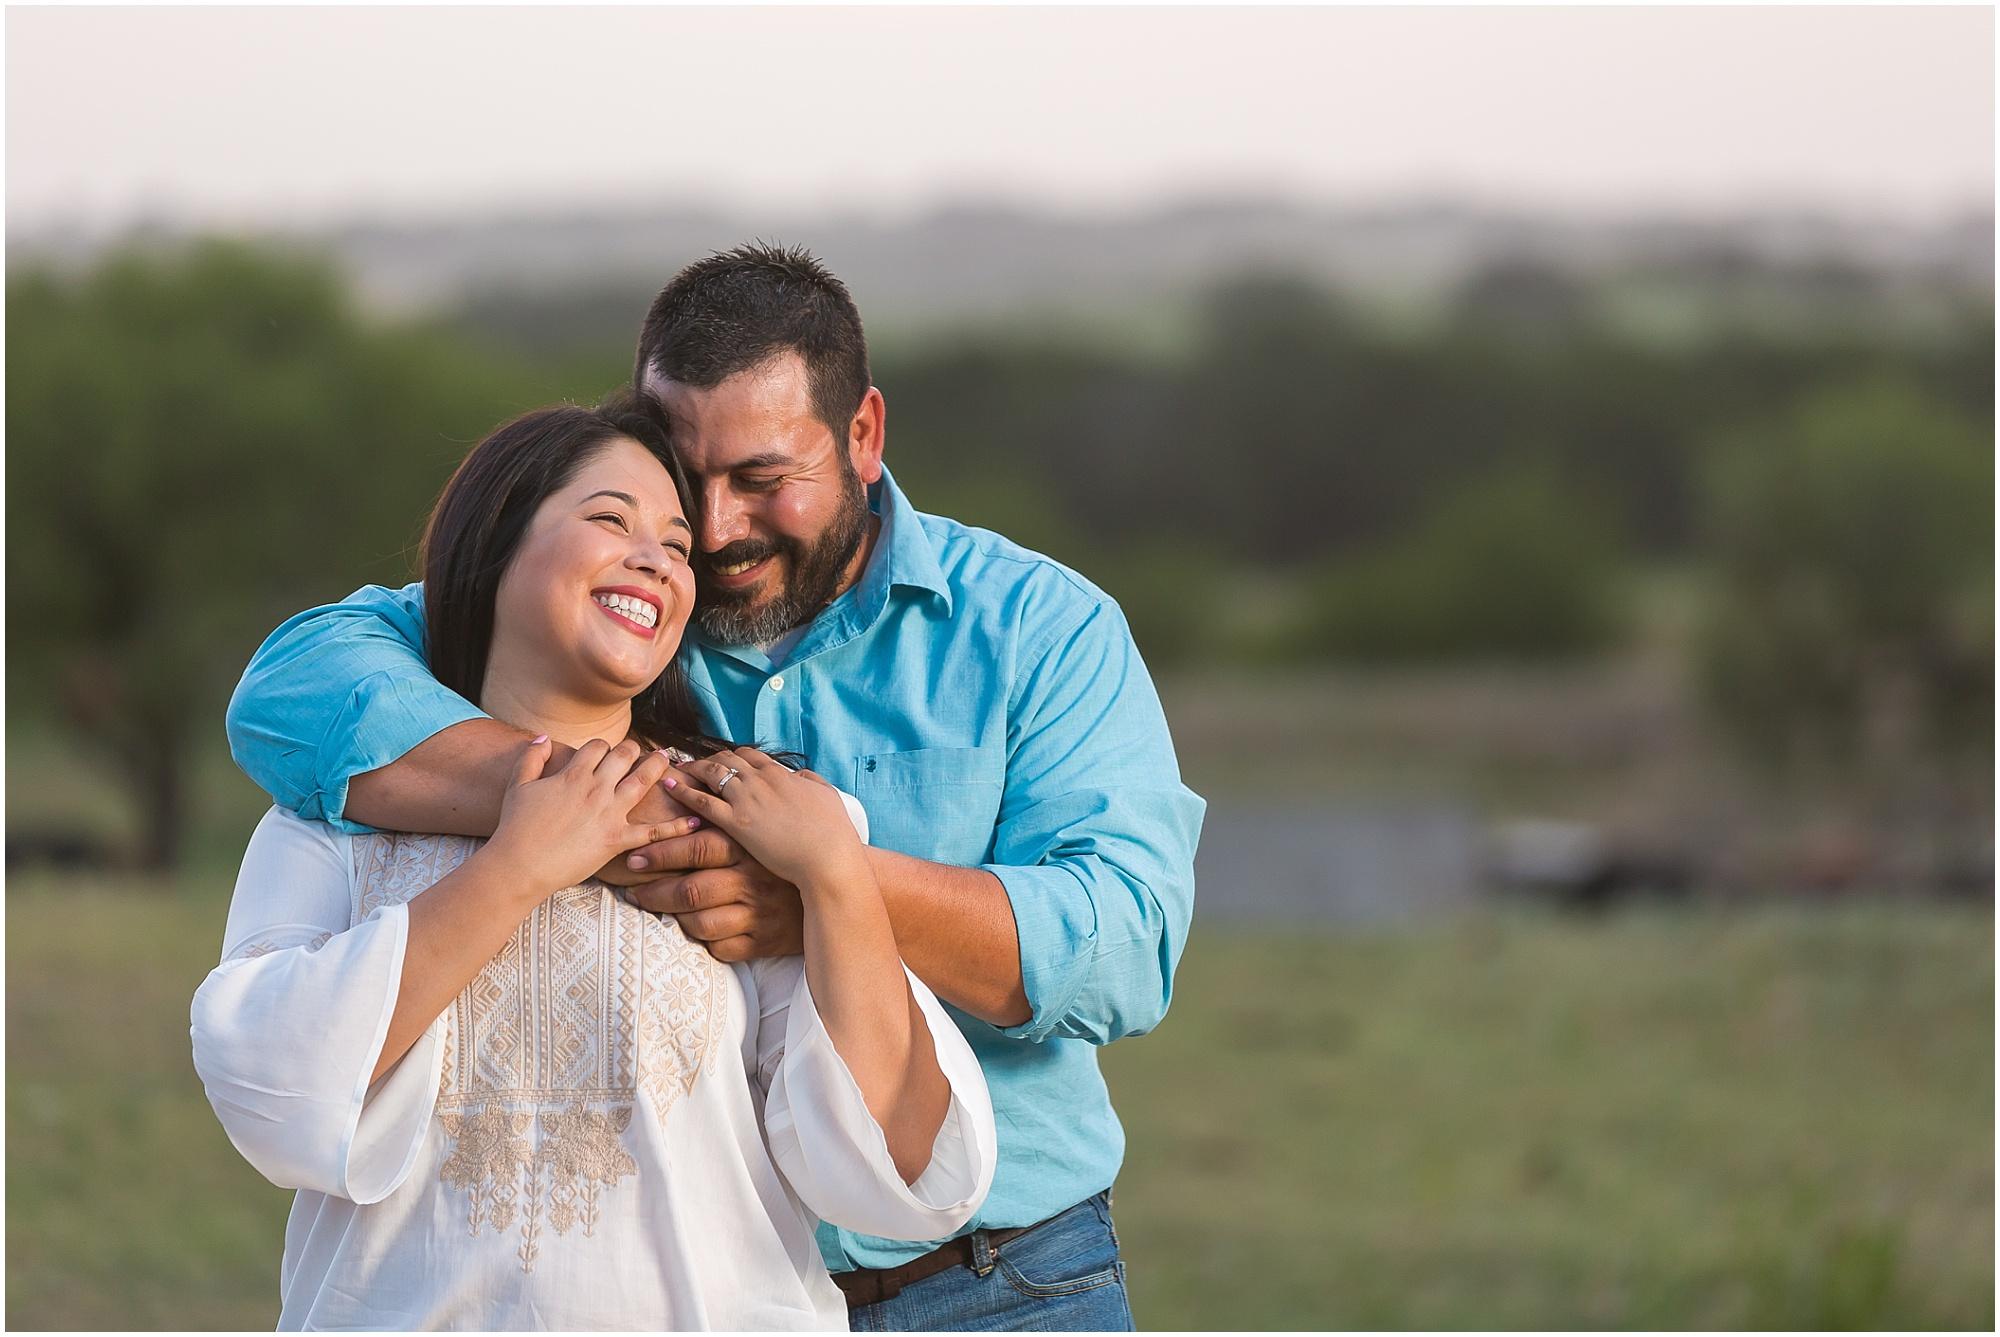 A couple laughs together while they hug, engagement portraits in Dublin, TX - Jason & Melaina Photography - www.jasonandmelaina.com